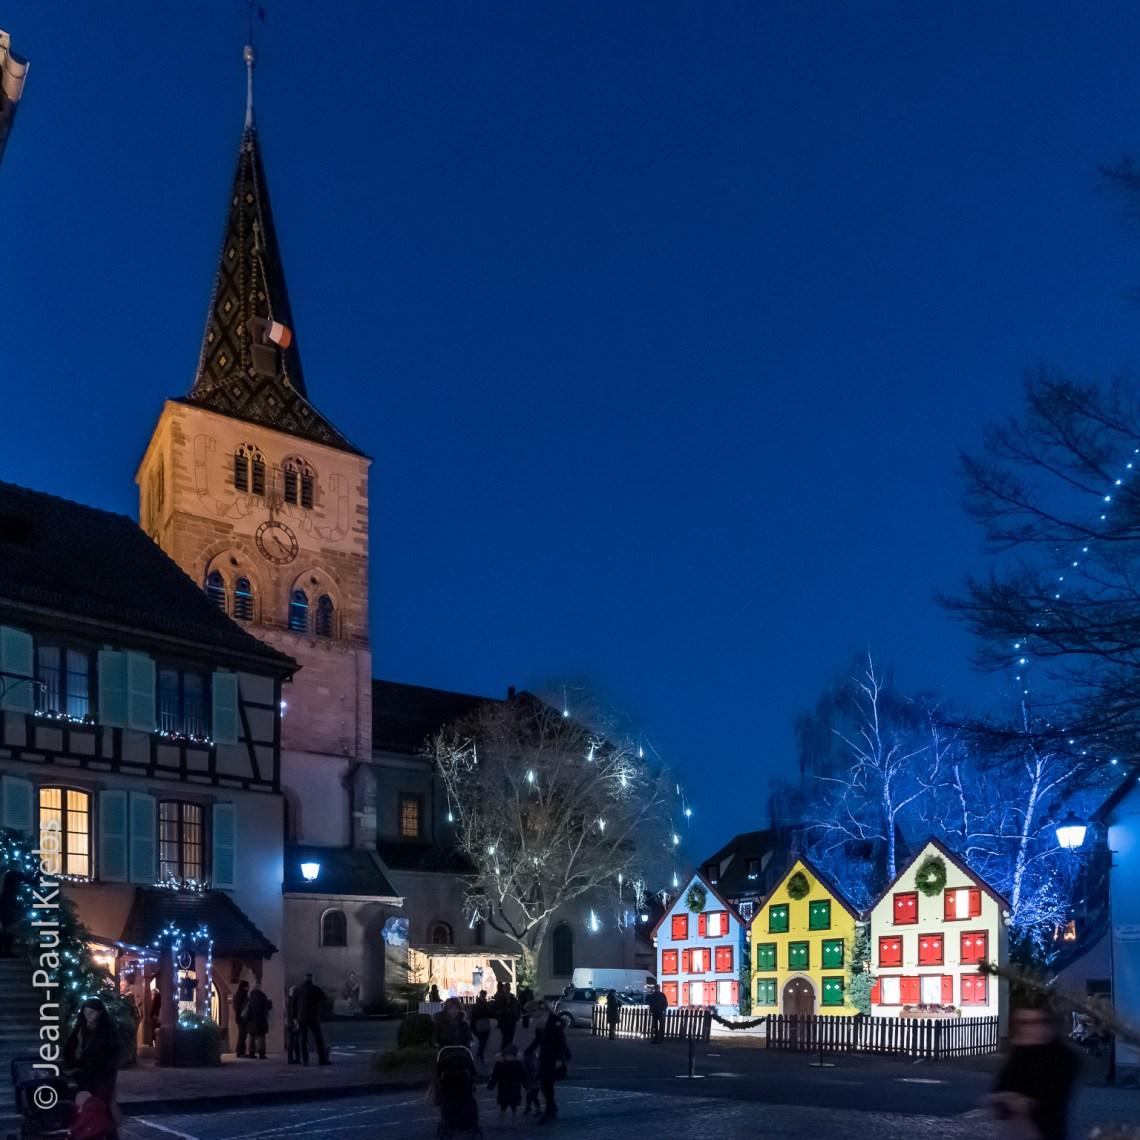 La charmante ville de Turckheim en habit de Noël.